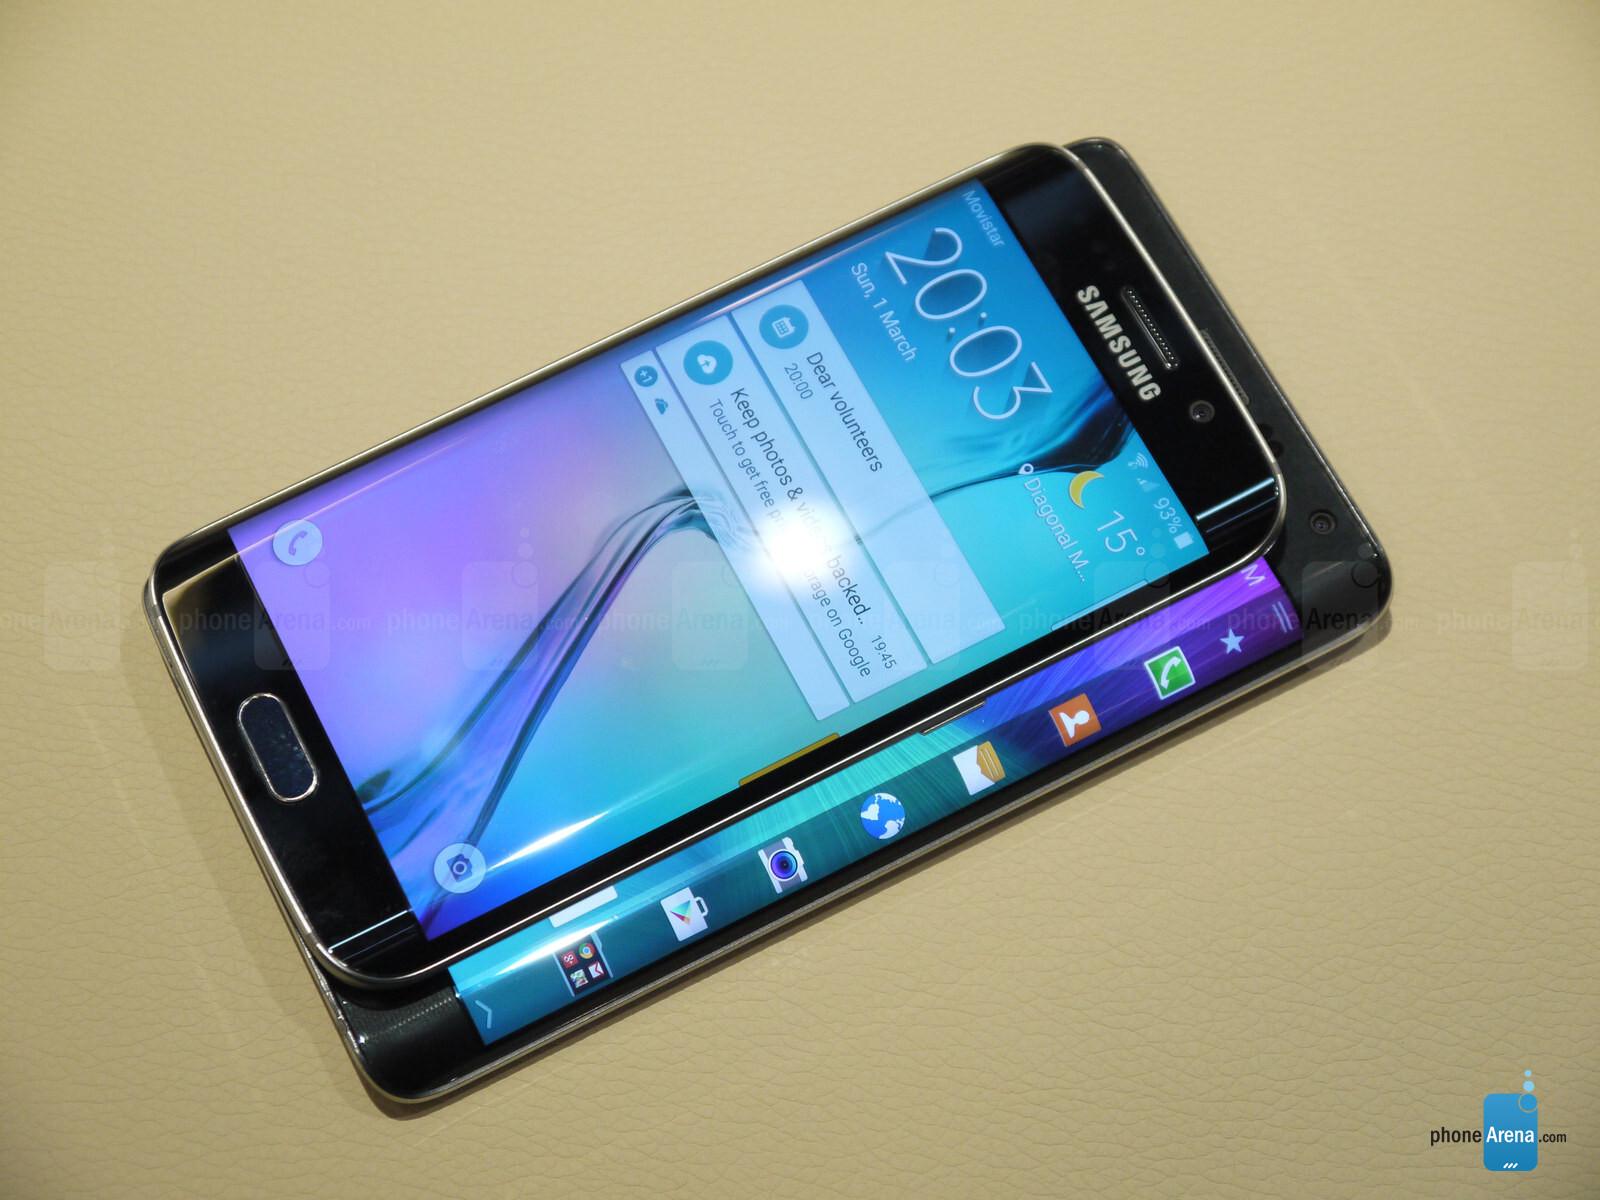 Samsung Galaxy S6 Edge Vs Galaxy Note Edge First Look